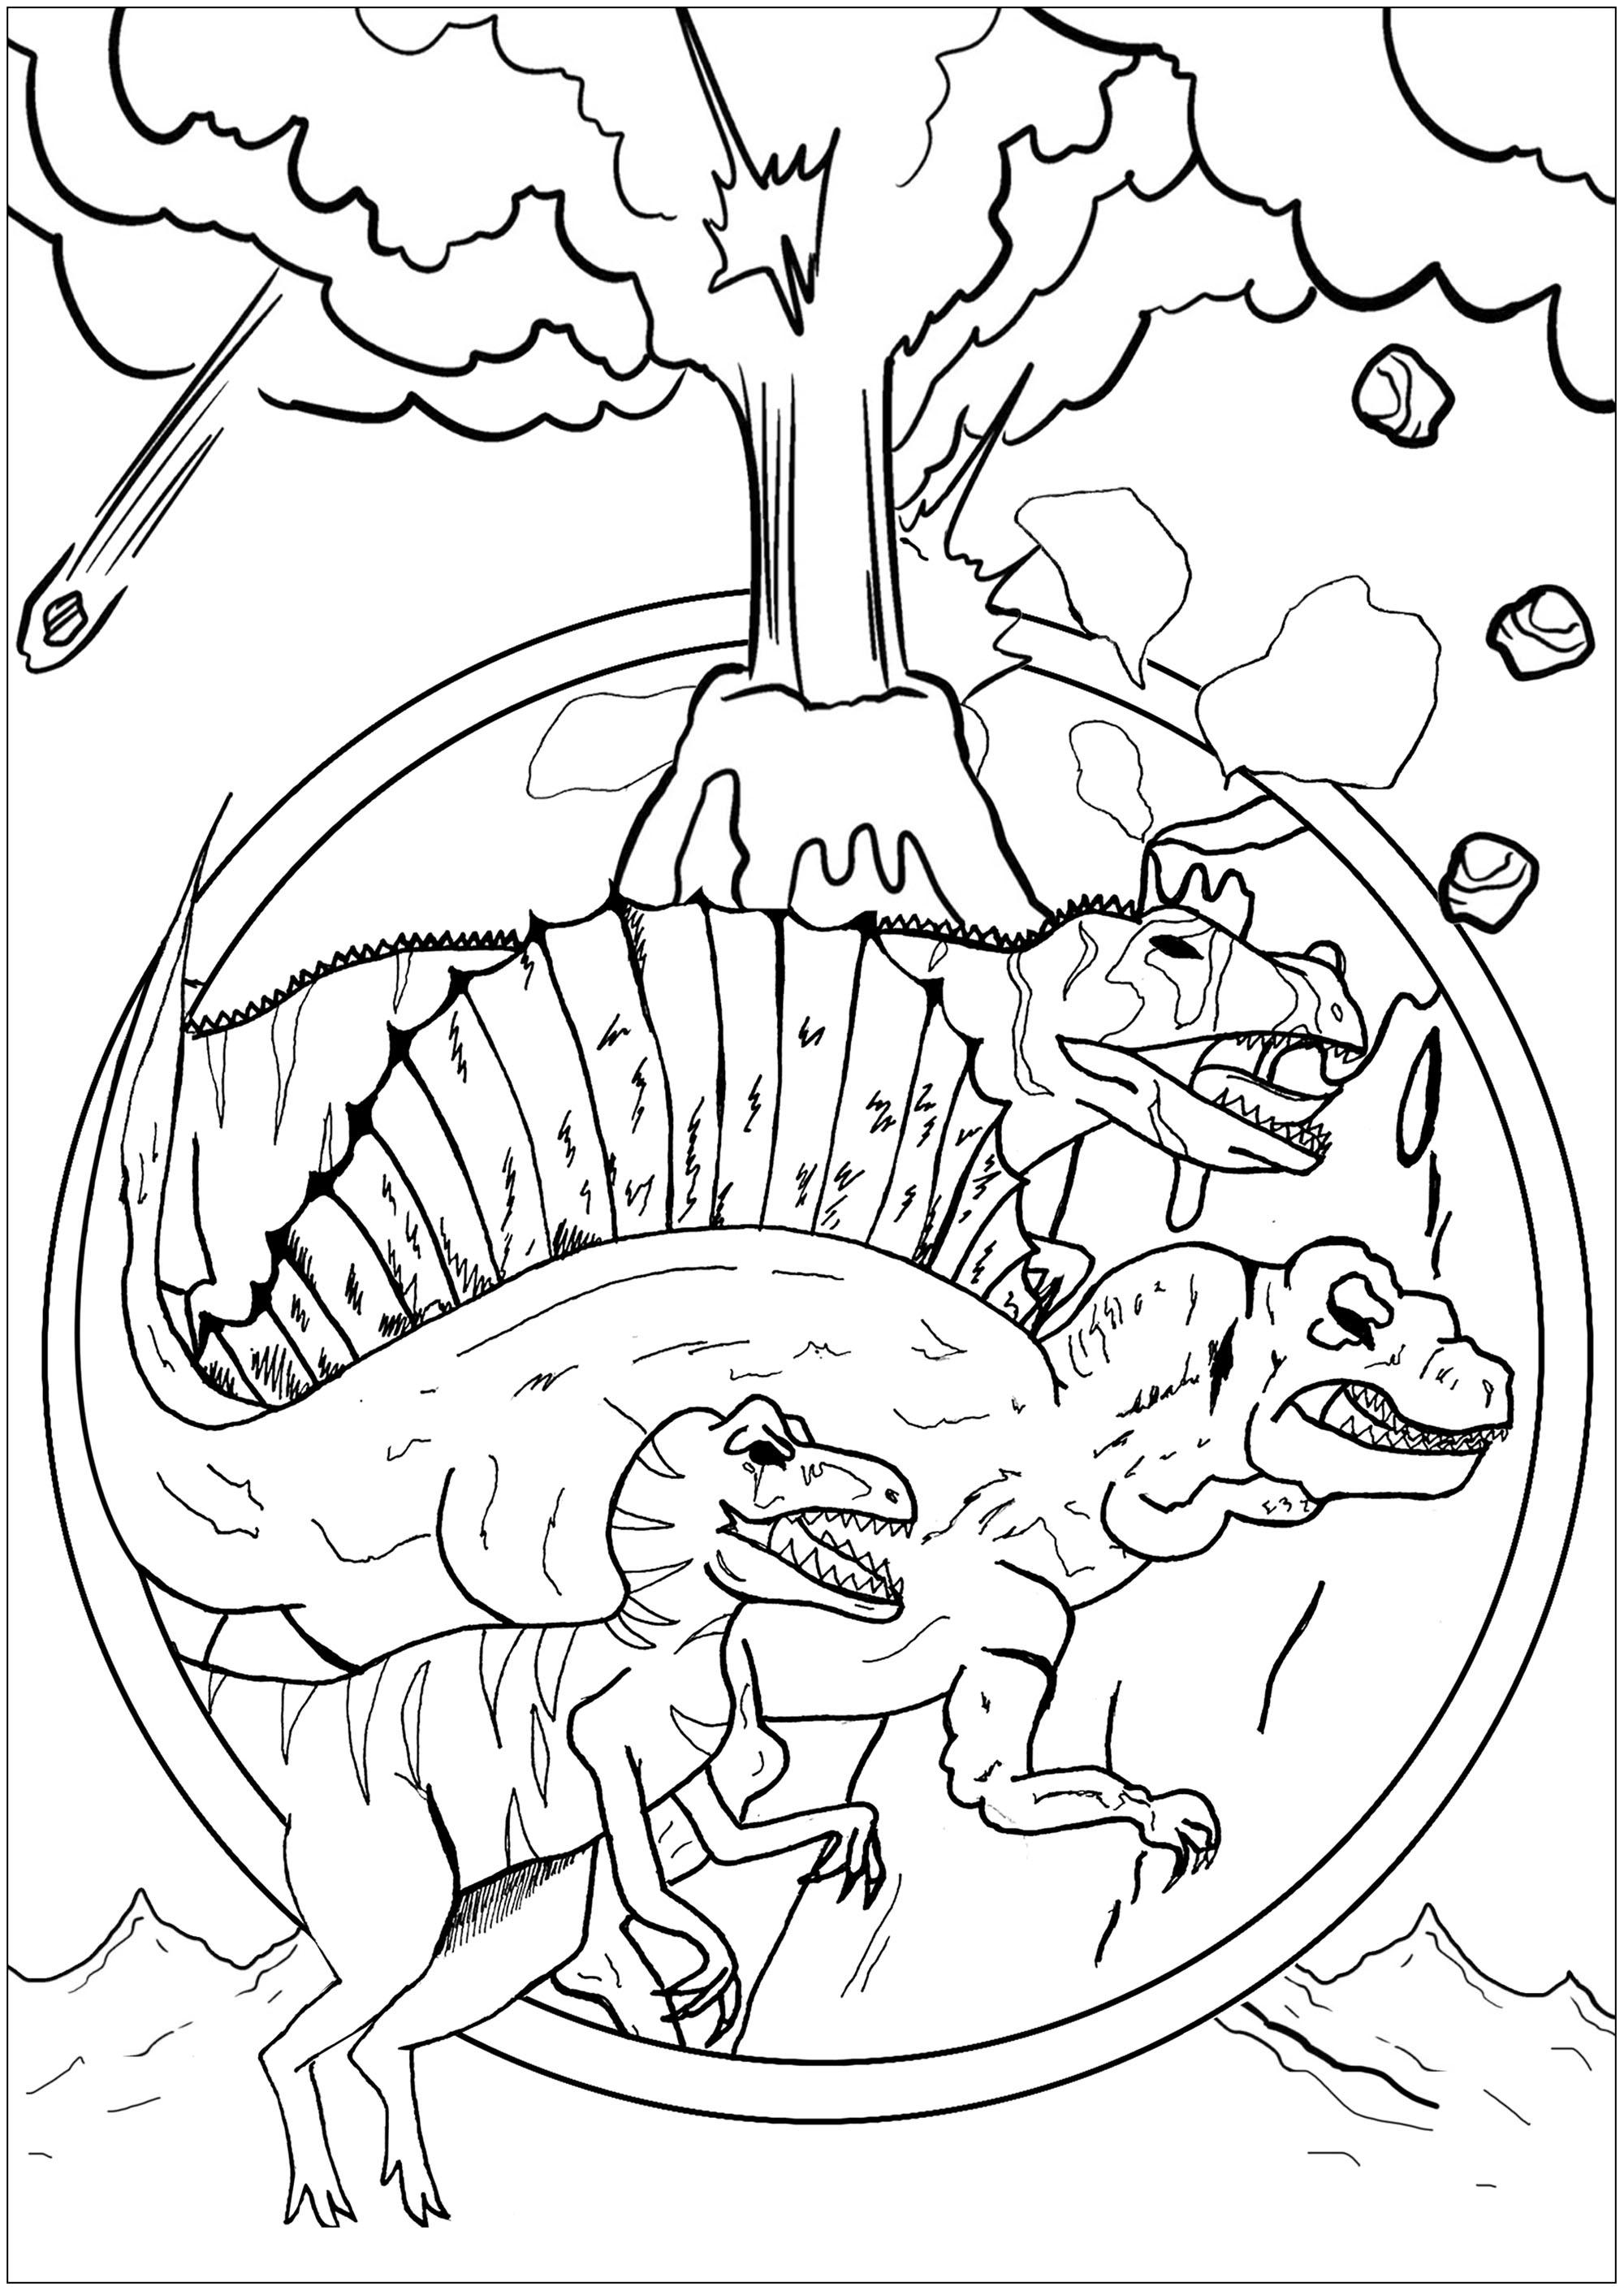 Dinosaurios 36051 - Dinosaurios - Colorear Para Adultos serapportantà Dinausore Coloriage